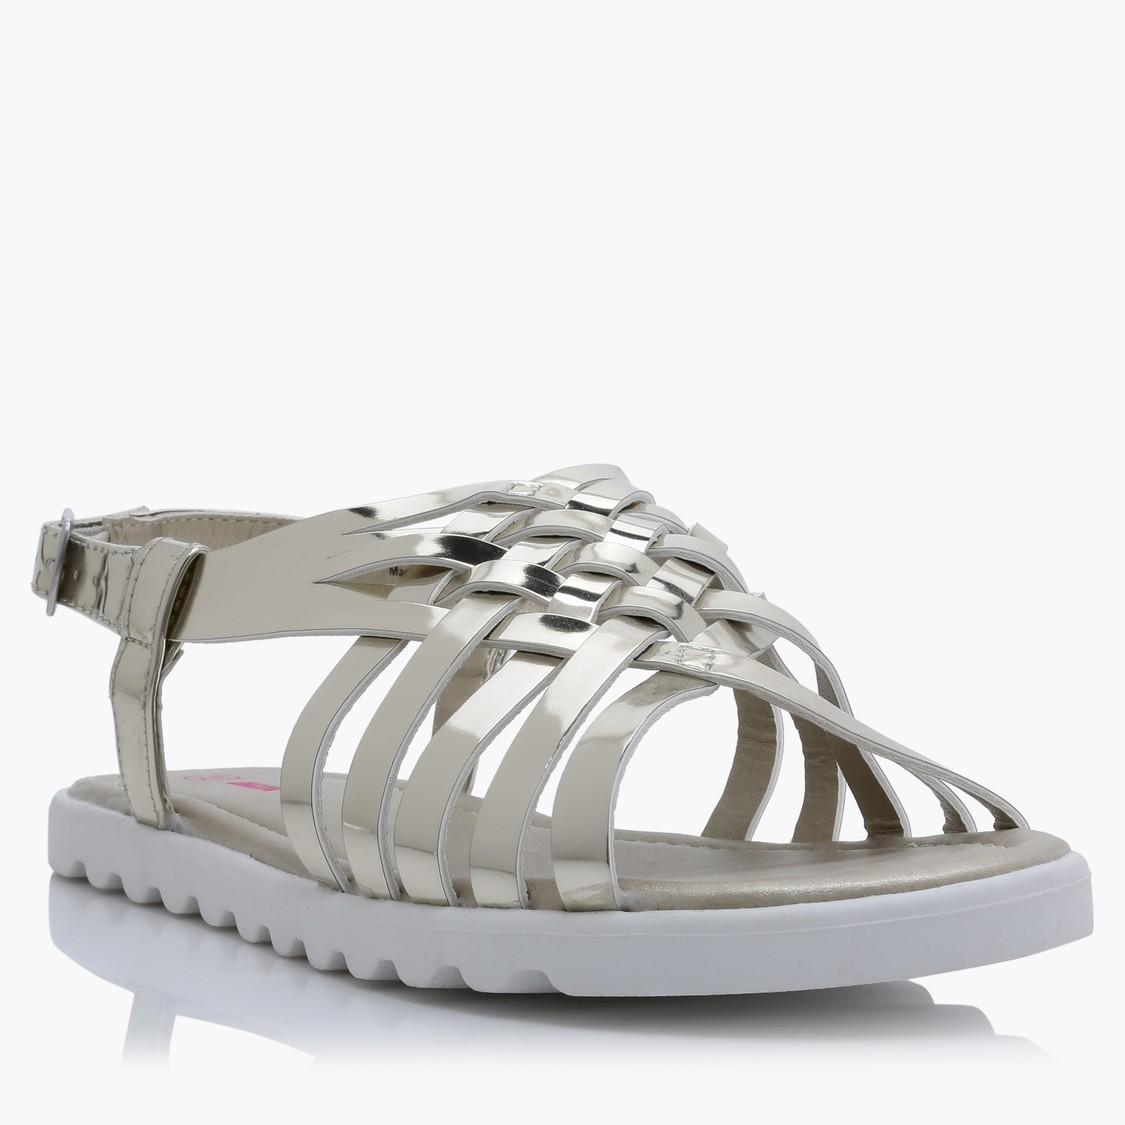 Metallic Sandals with Buckle Closure